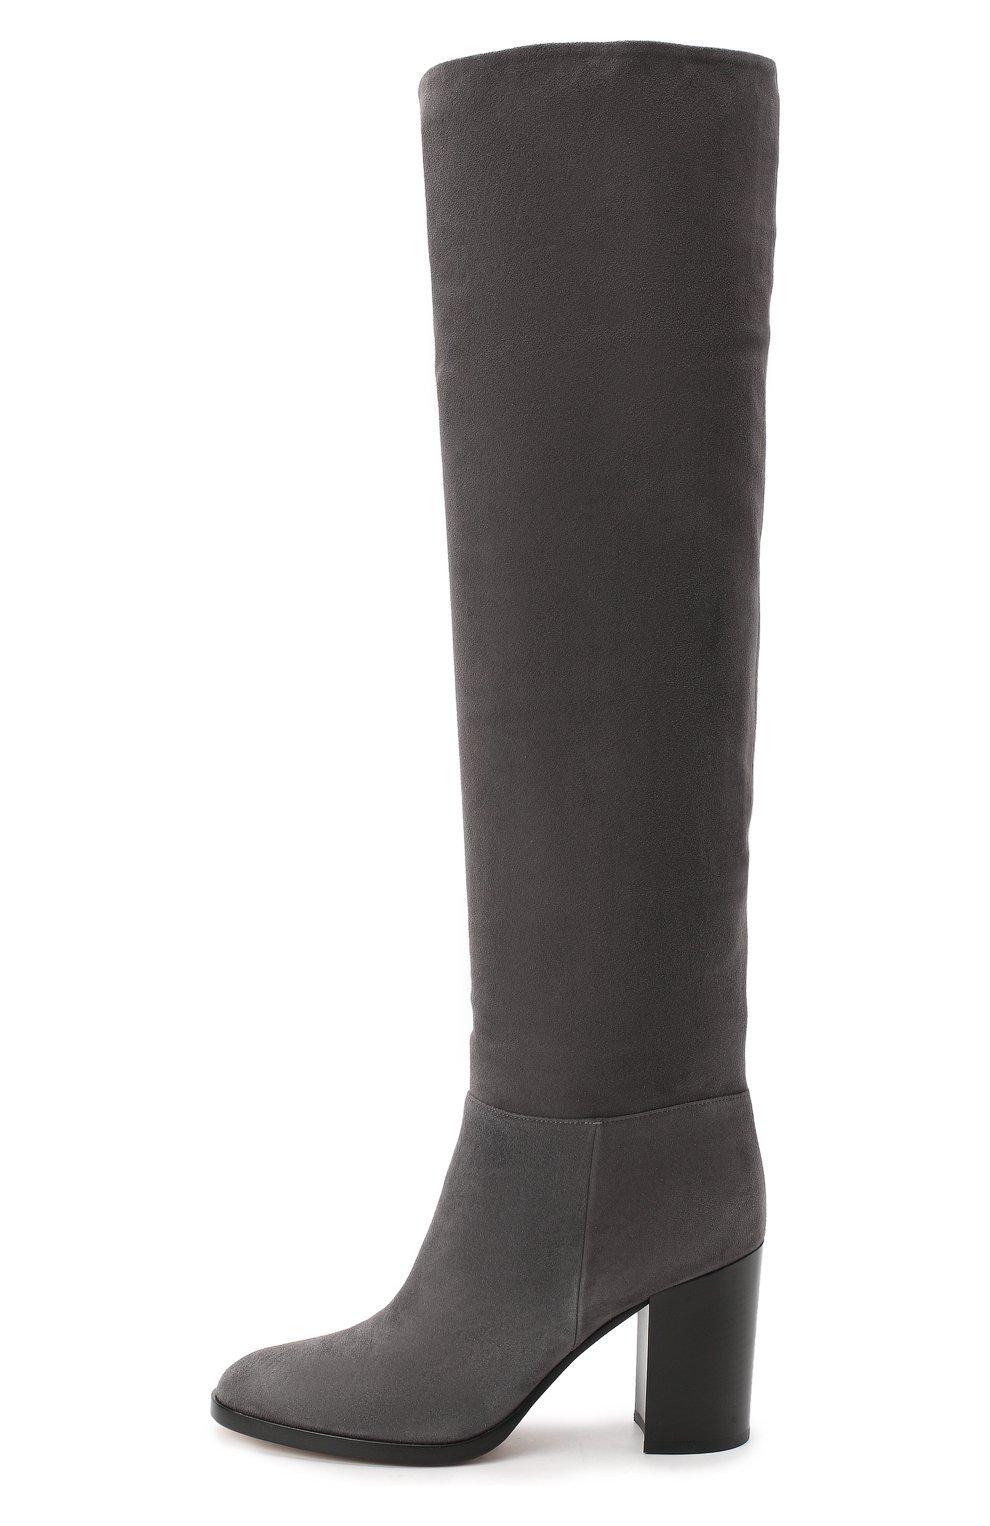 Женские замшевые сапоги daywear GIANVITO ROSSI серого цвета, арт. G80484.85CU0.C45LAPI | Фото 3